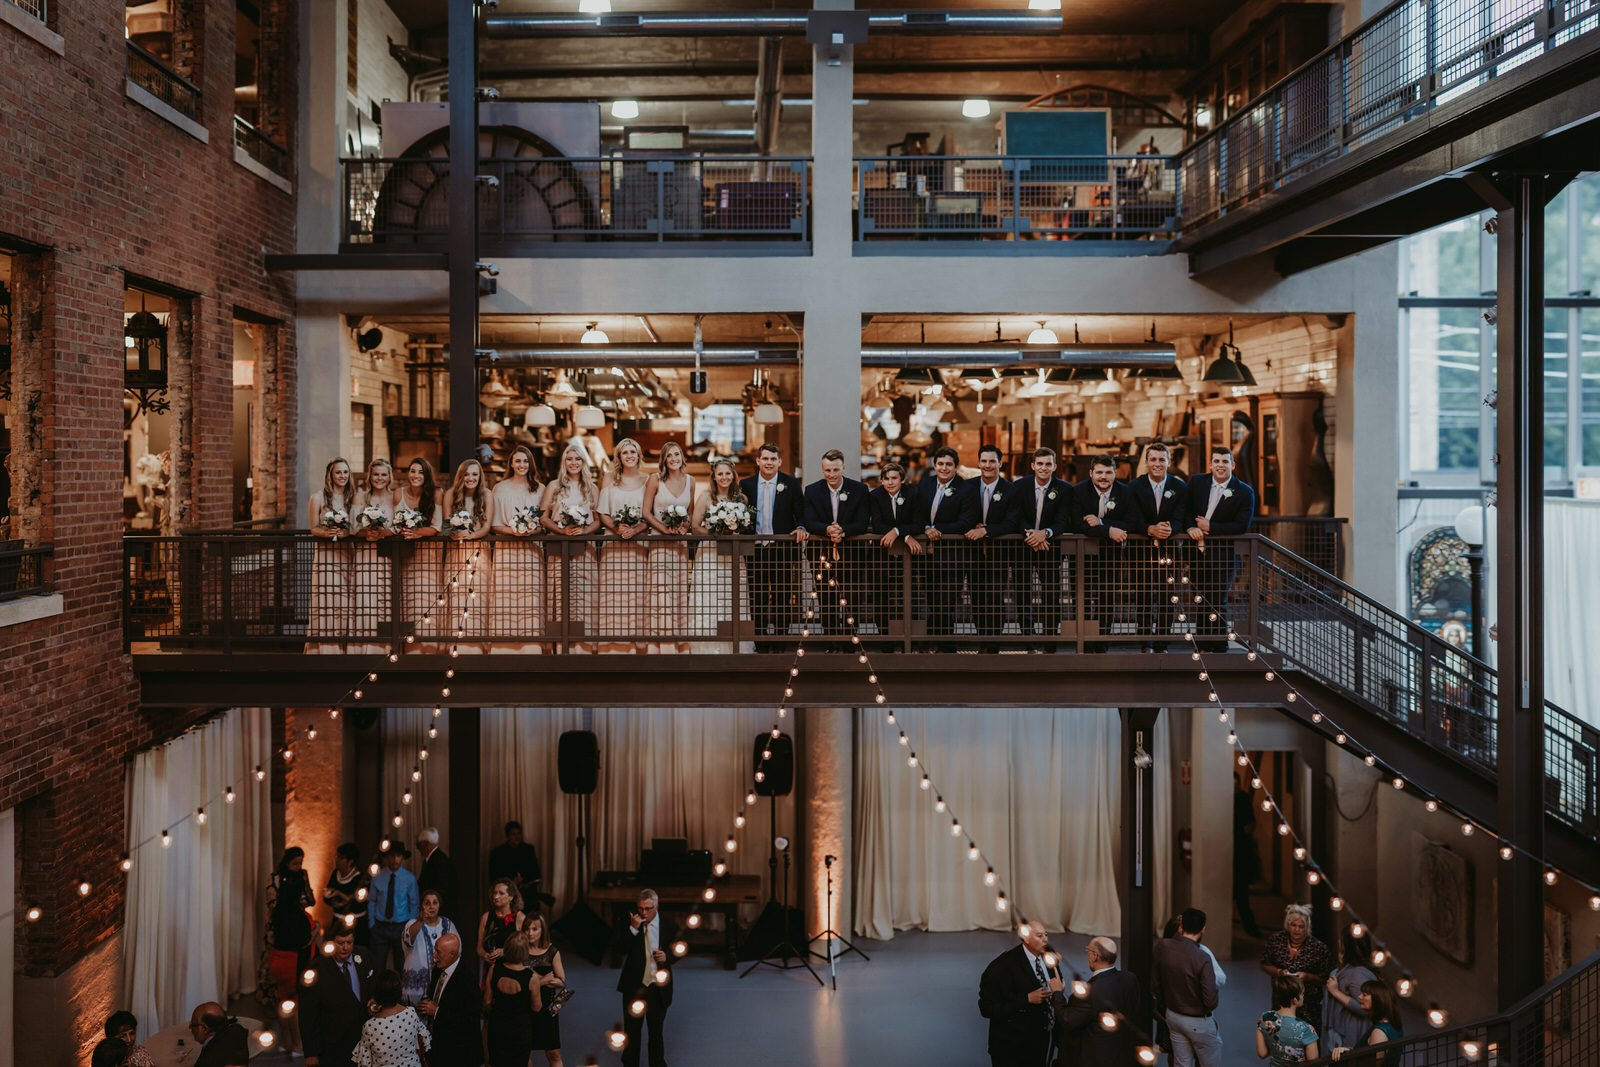 Architectural artifacts wedding photography, pavel adamek, the adamkovi